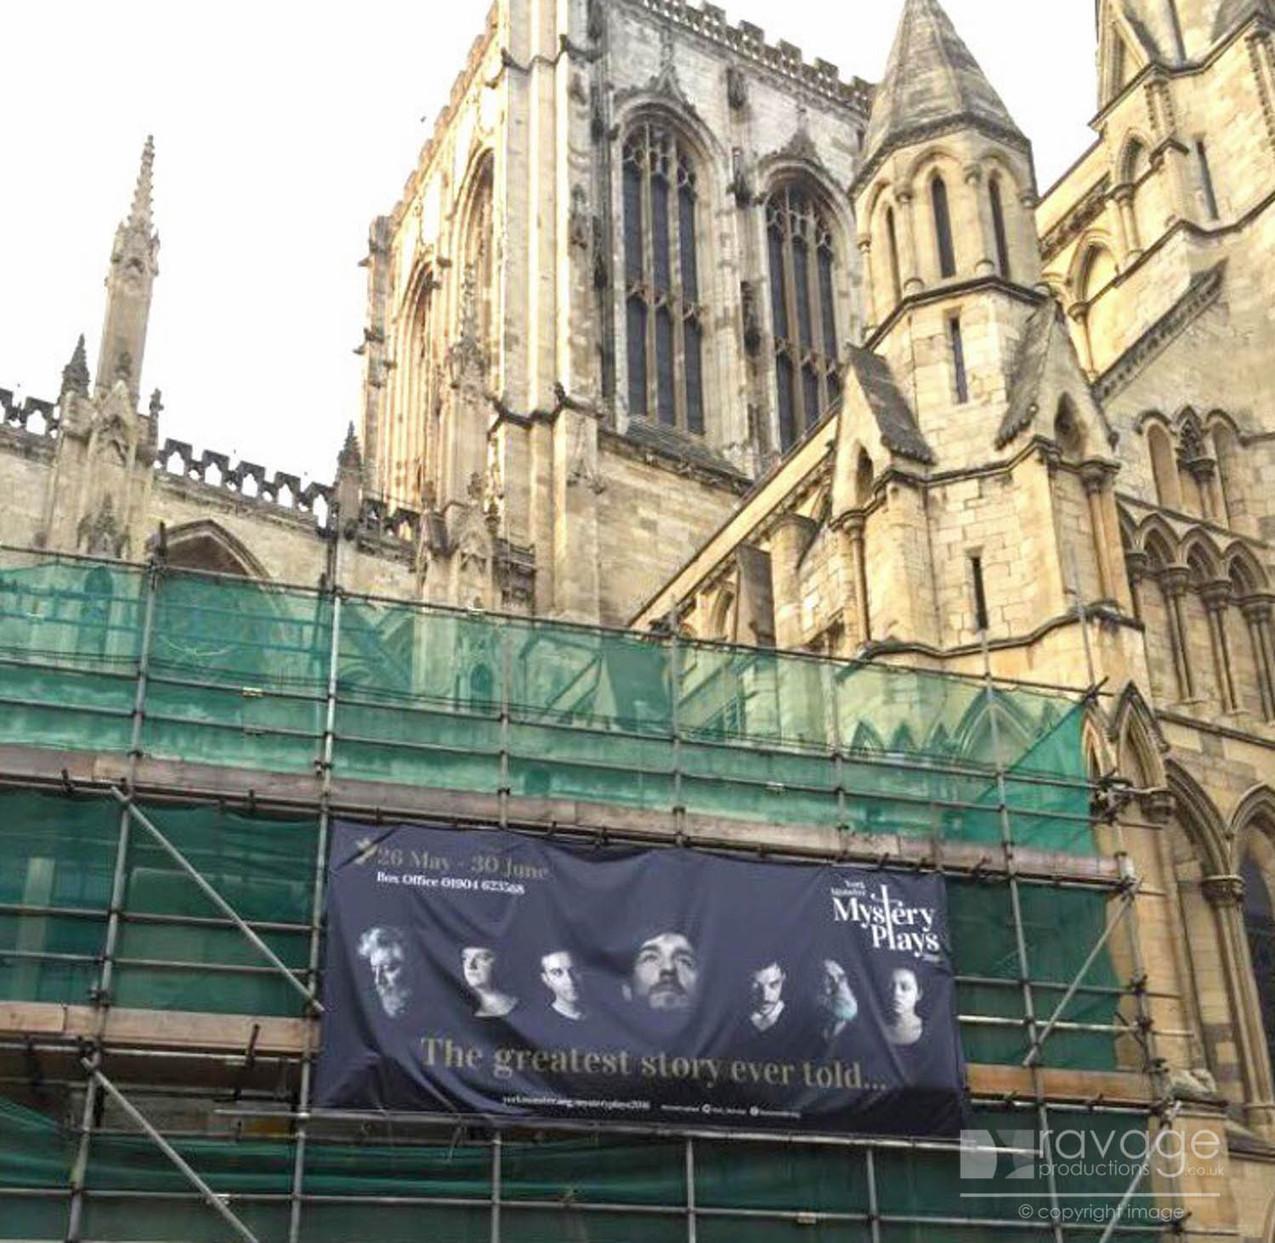 Banner on the Minster